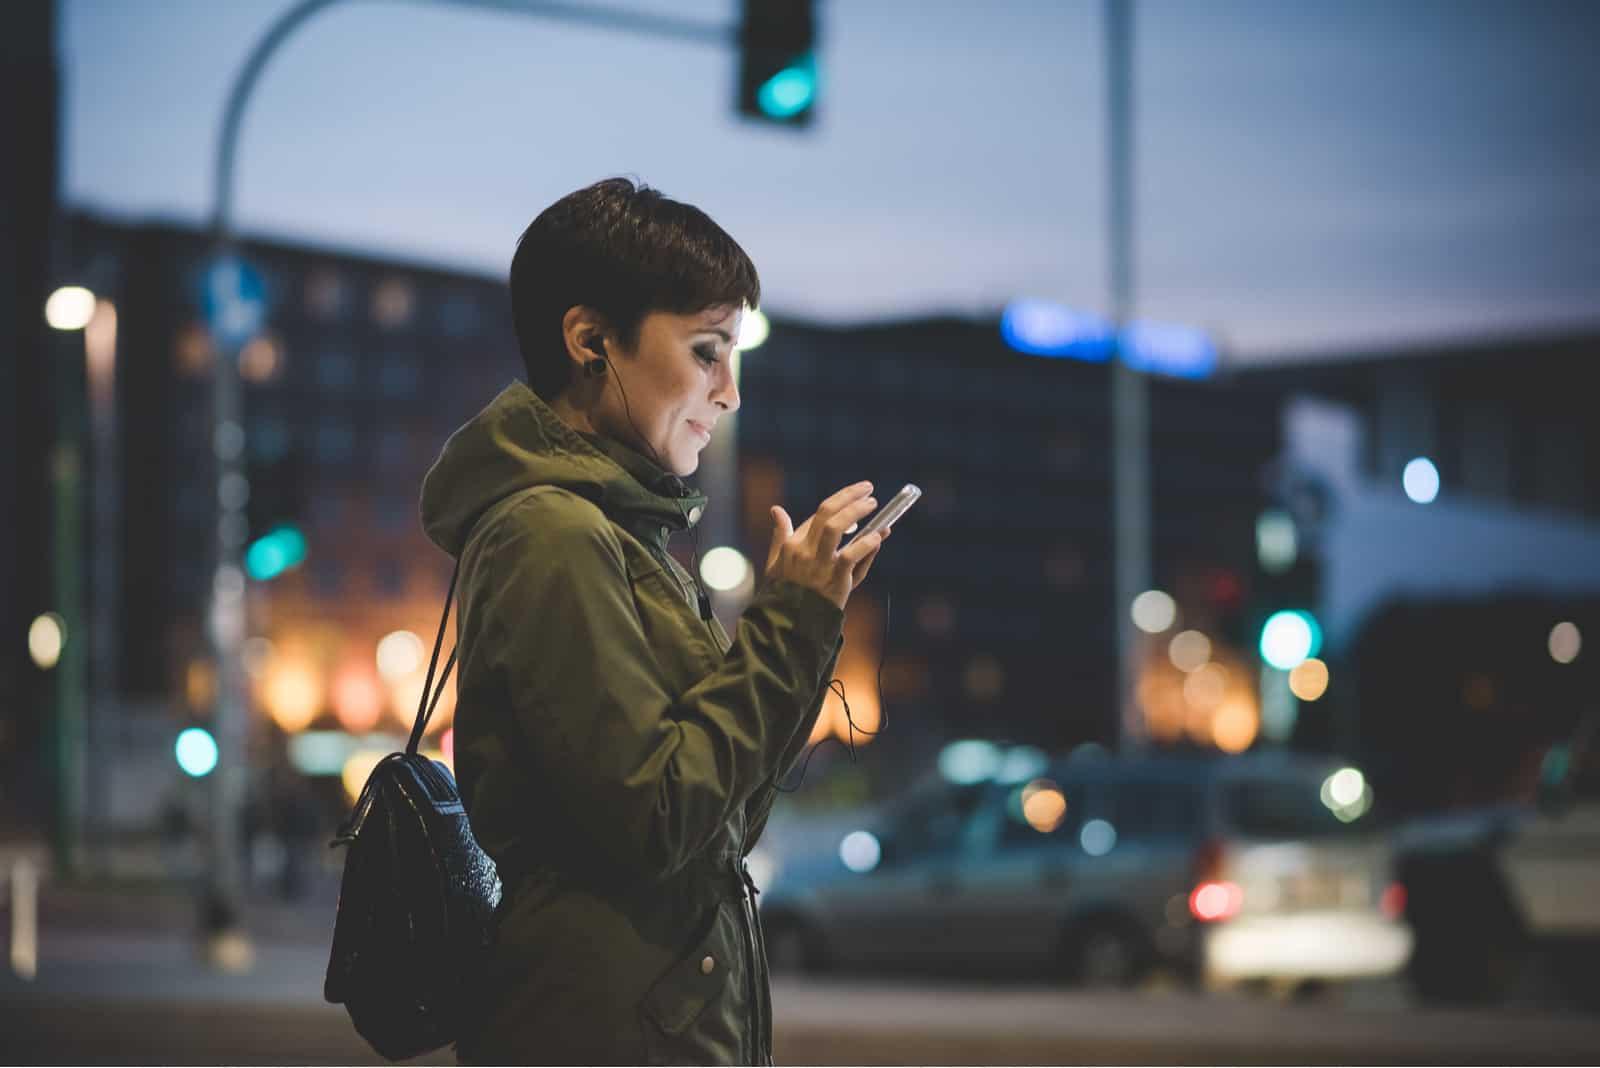 femme tenant un smartphone regardant vers le bas